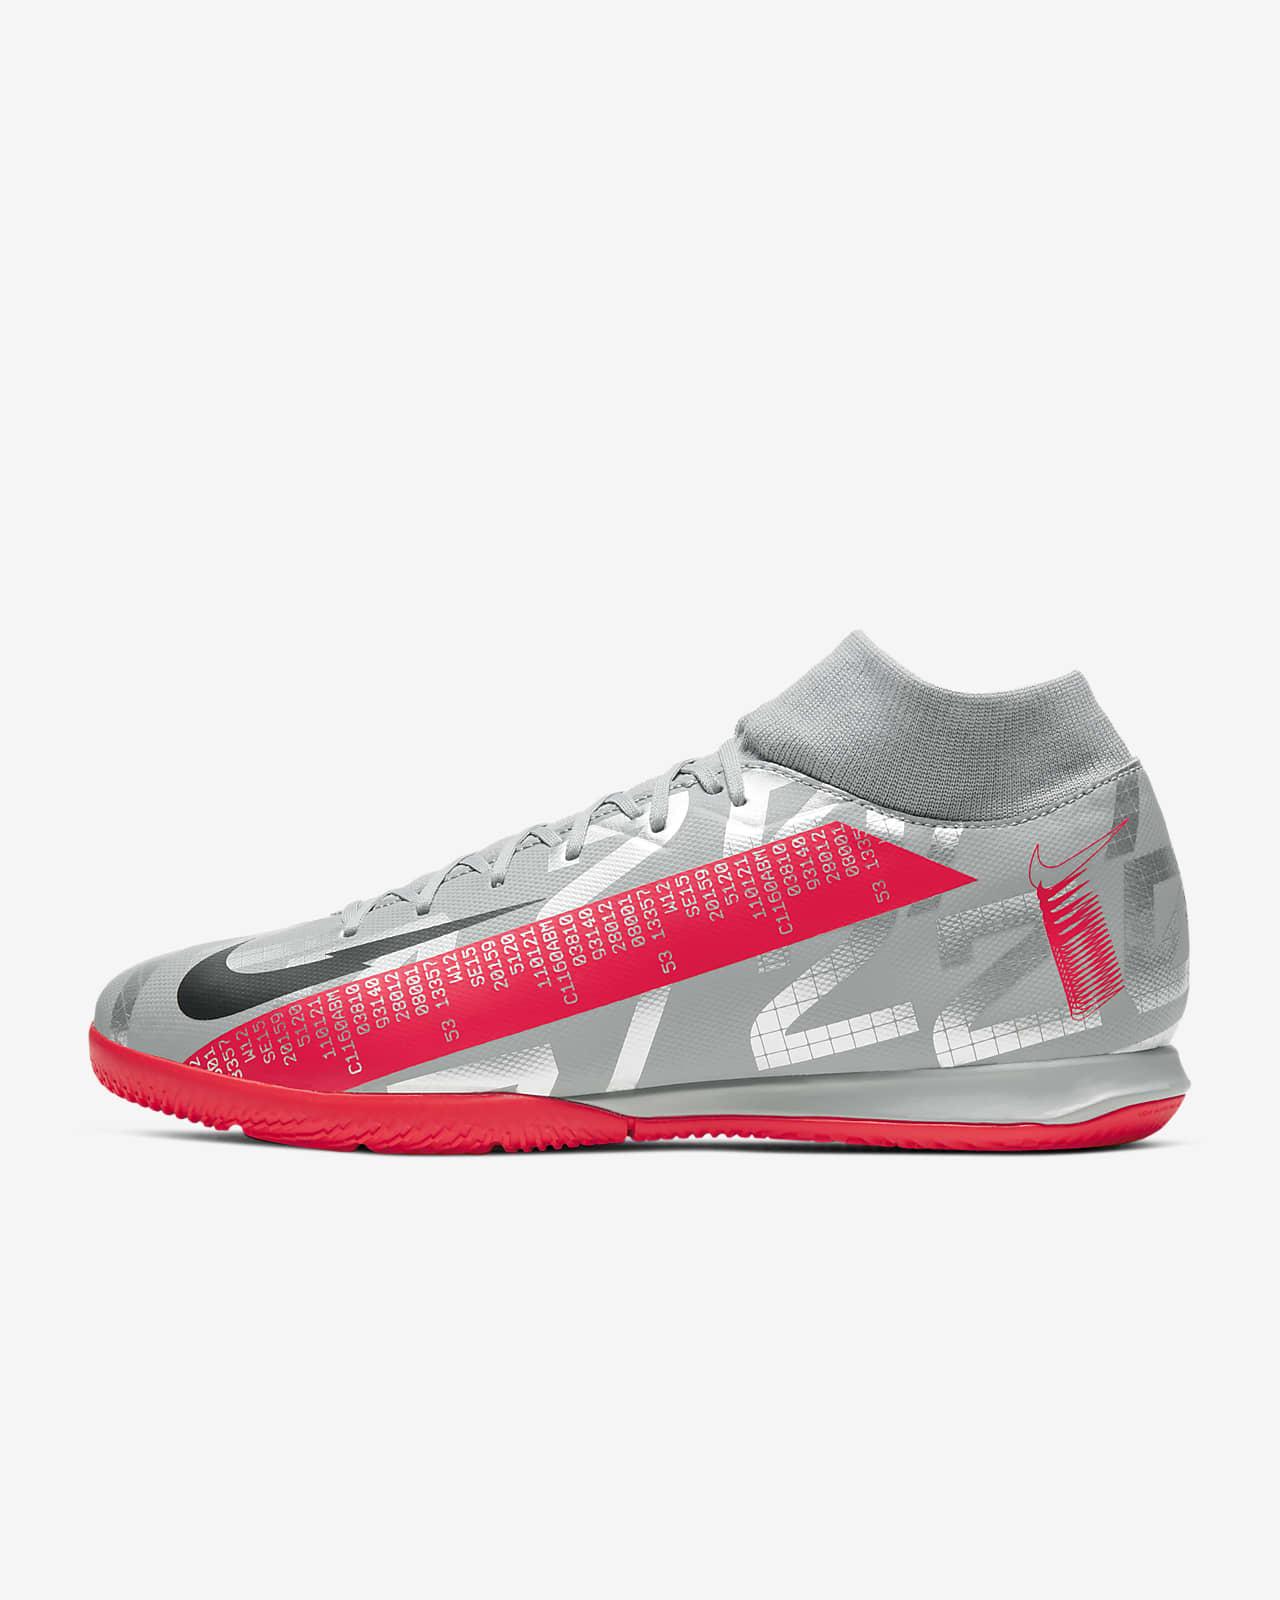 chaussure pour footsale nike